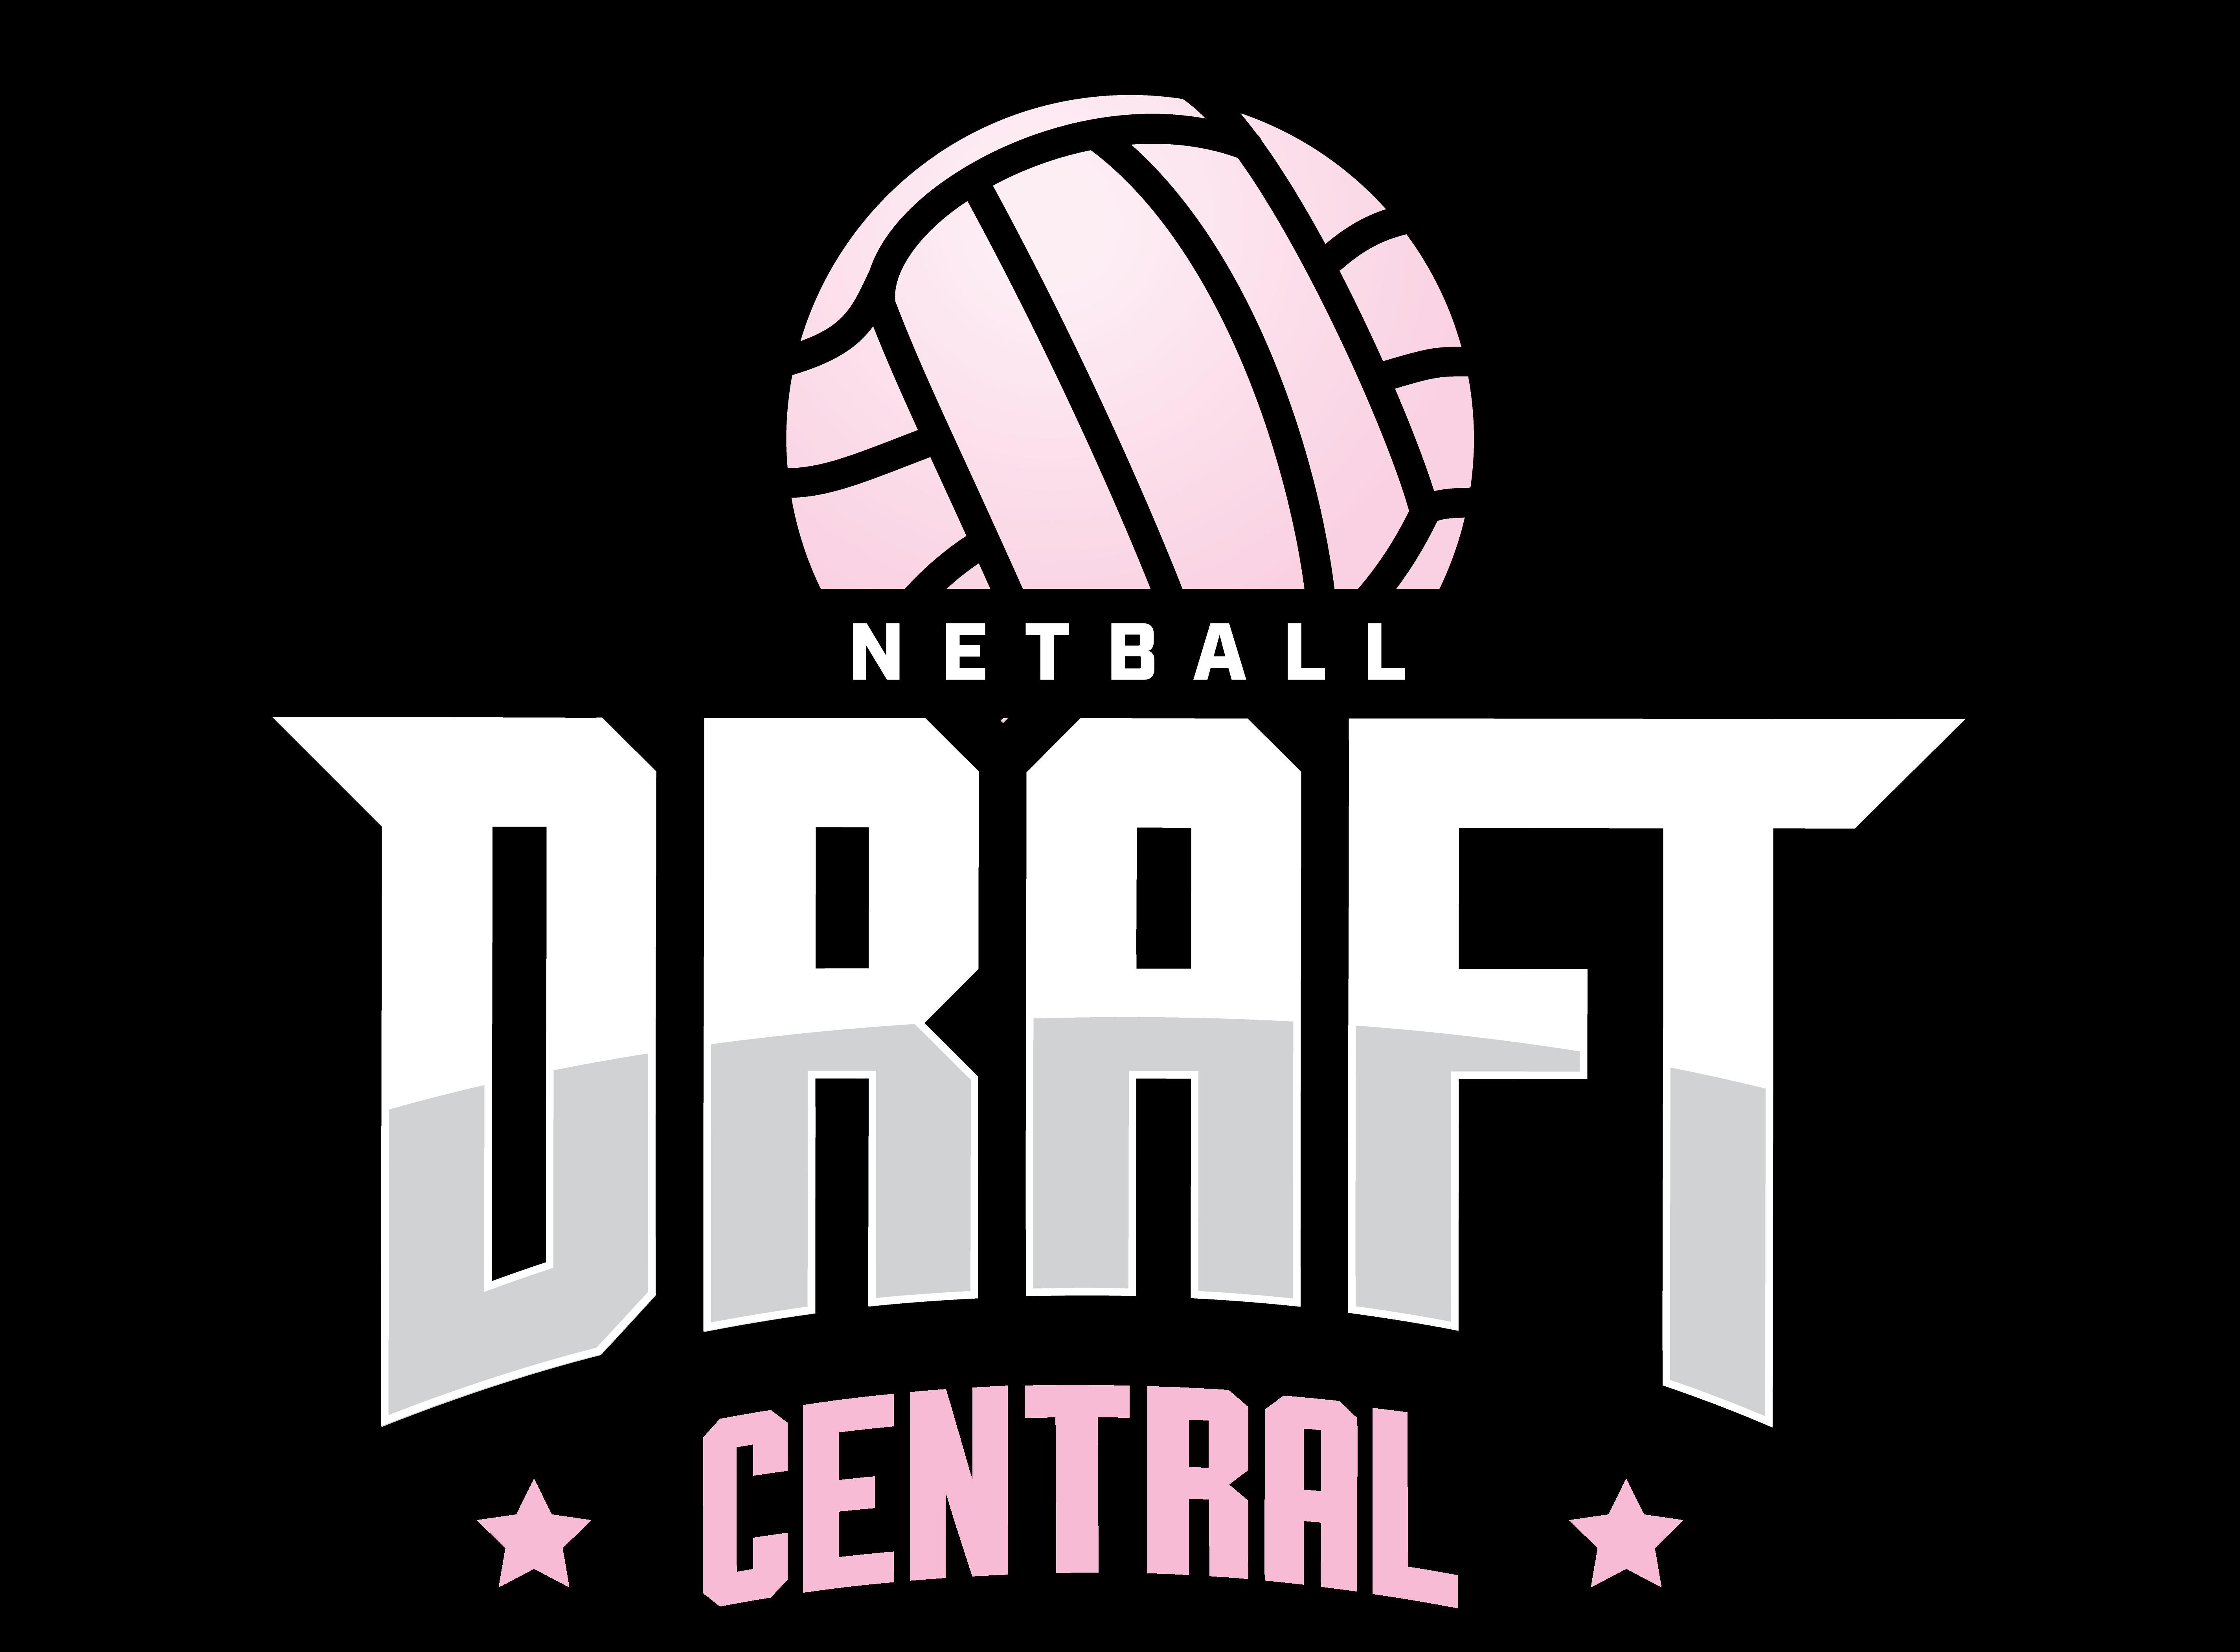 Netball Draft Central